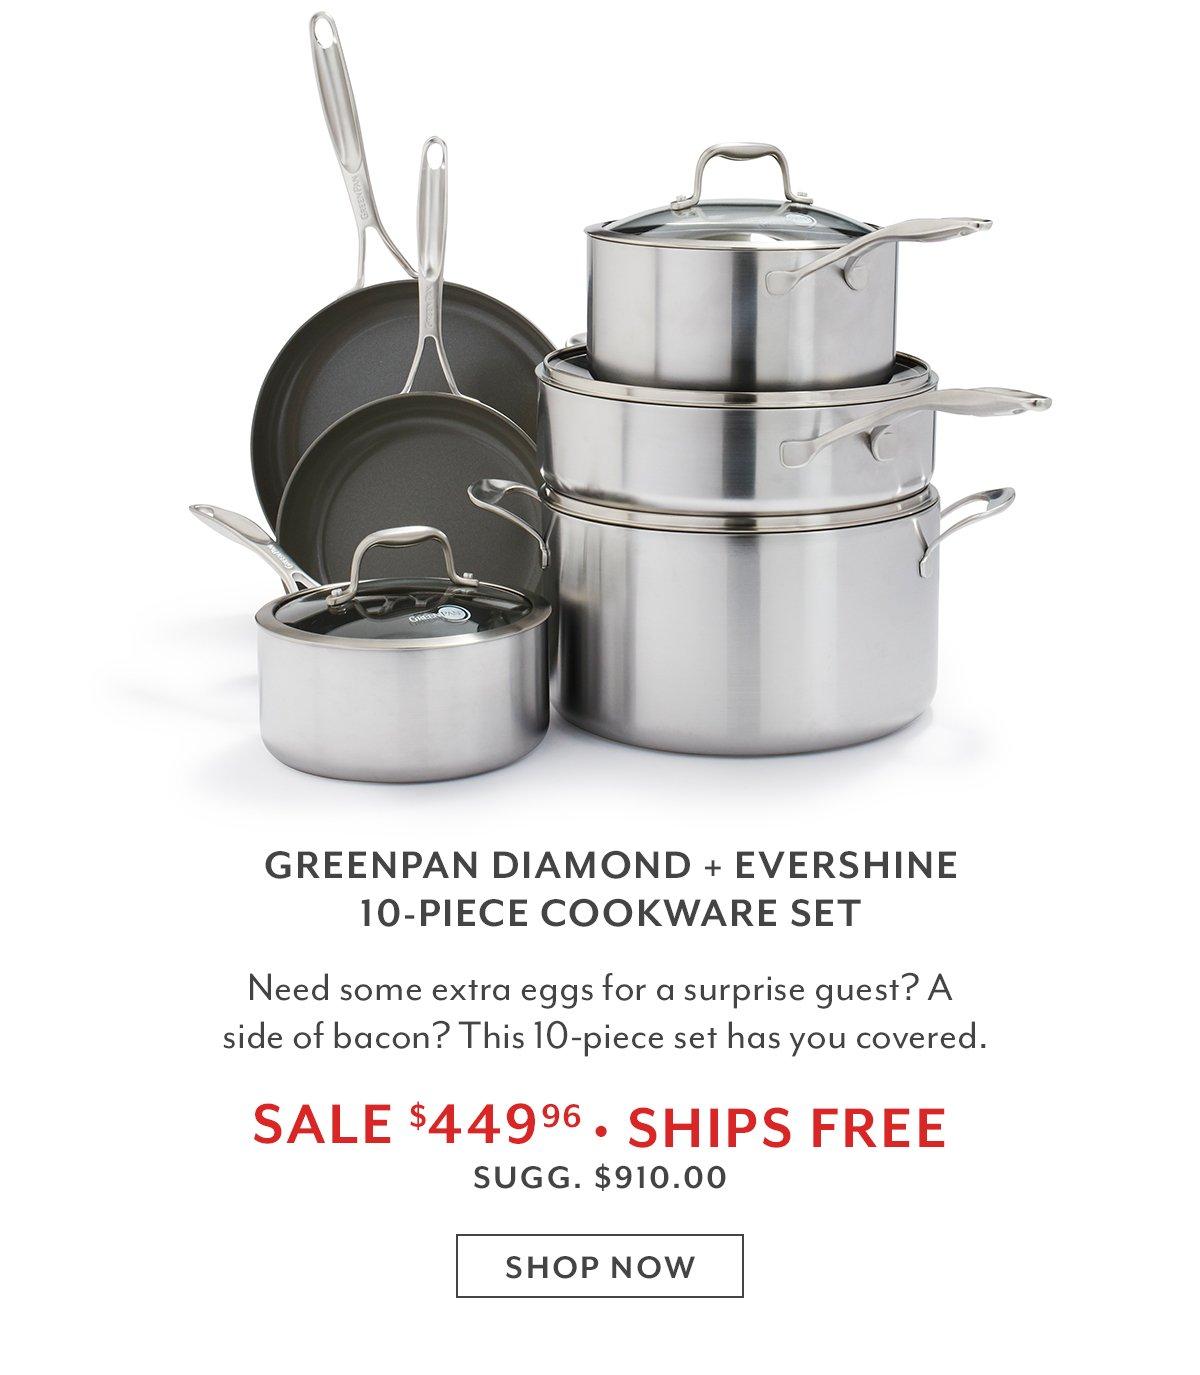 GreenPan Diamond + Evershine 10-PC Cookware Set